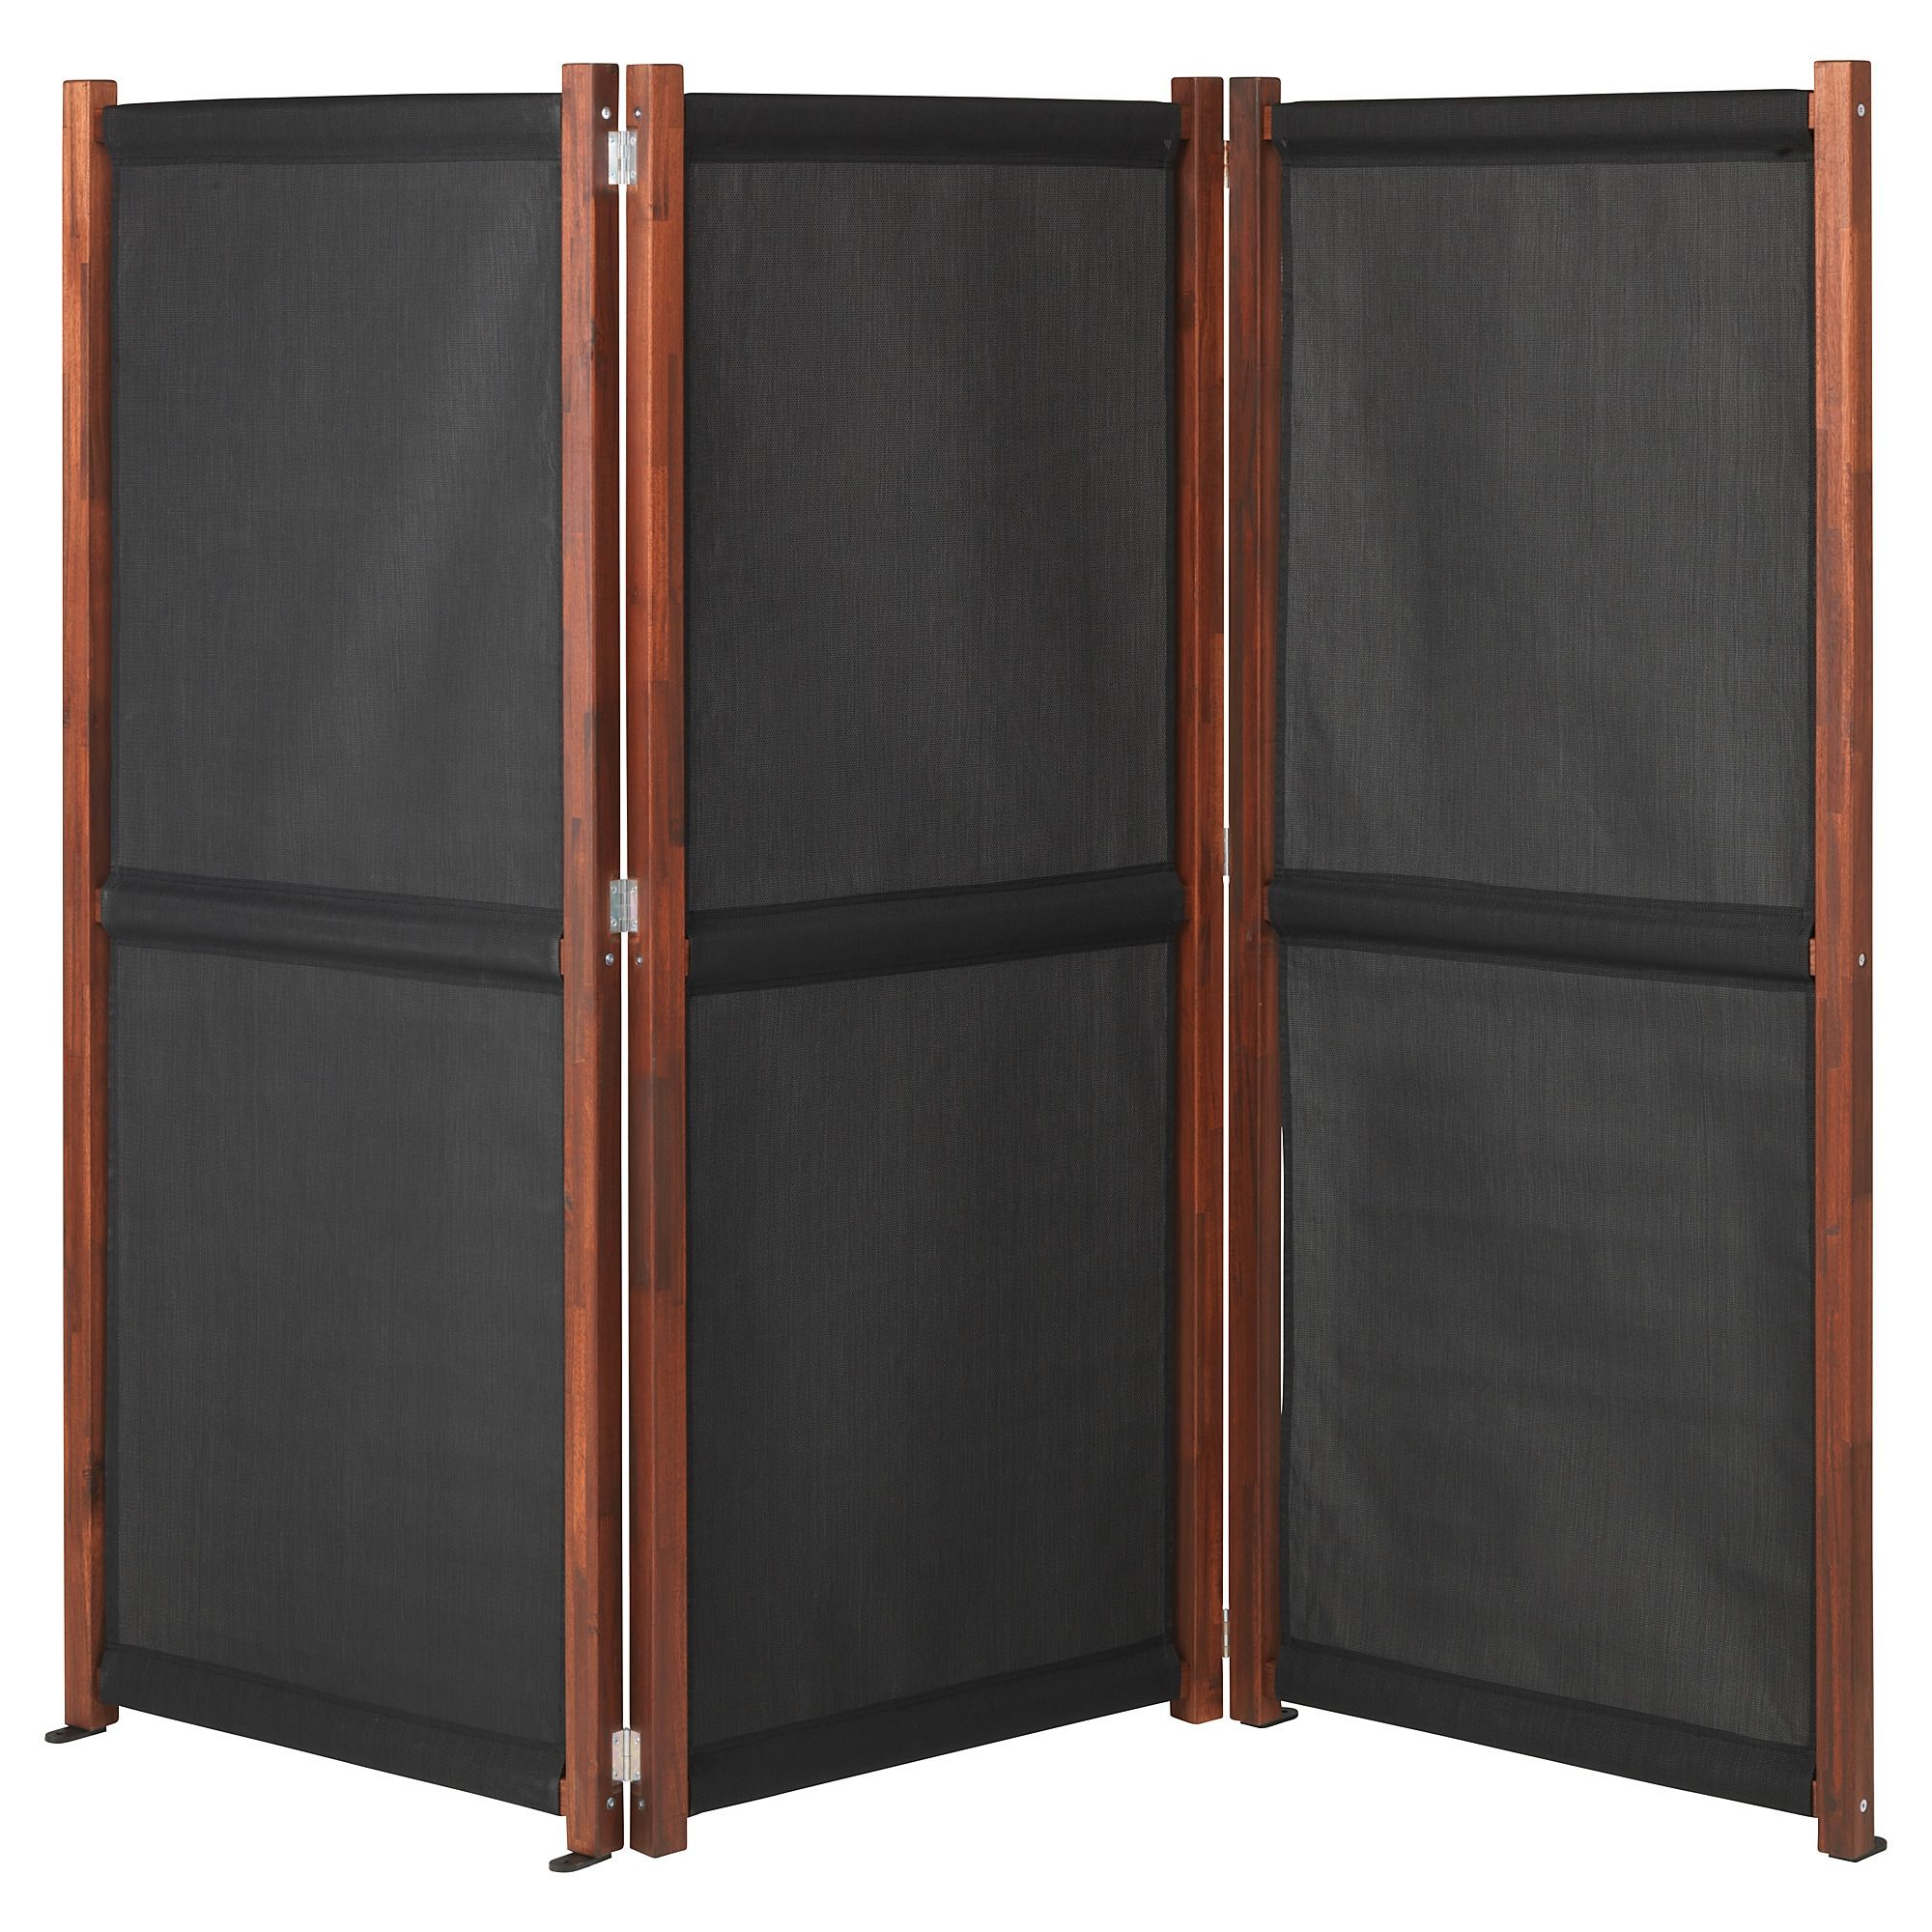 30 Marvelous Divide Room Decoration Ideas That Look More Comfort Room Divider Doors Ikea Room Divider Sliding Room Dividers